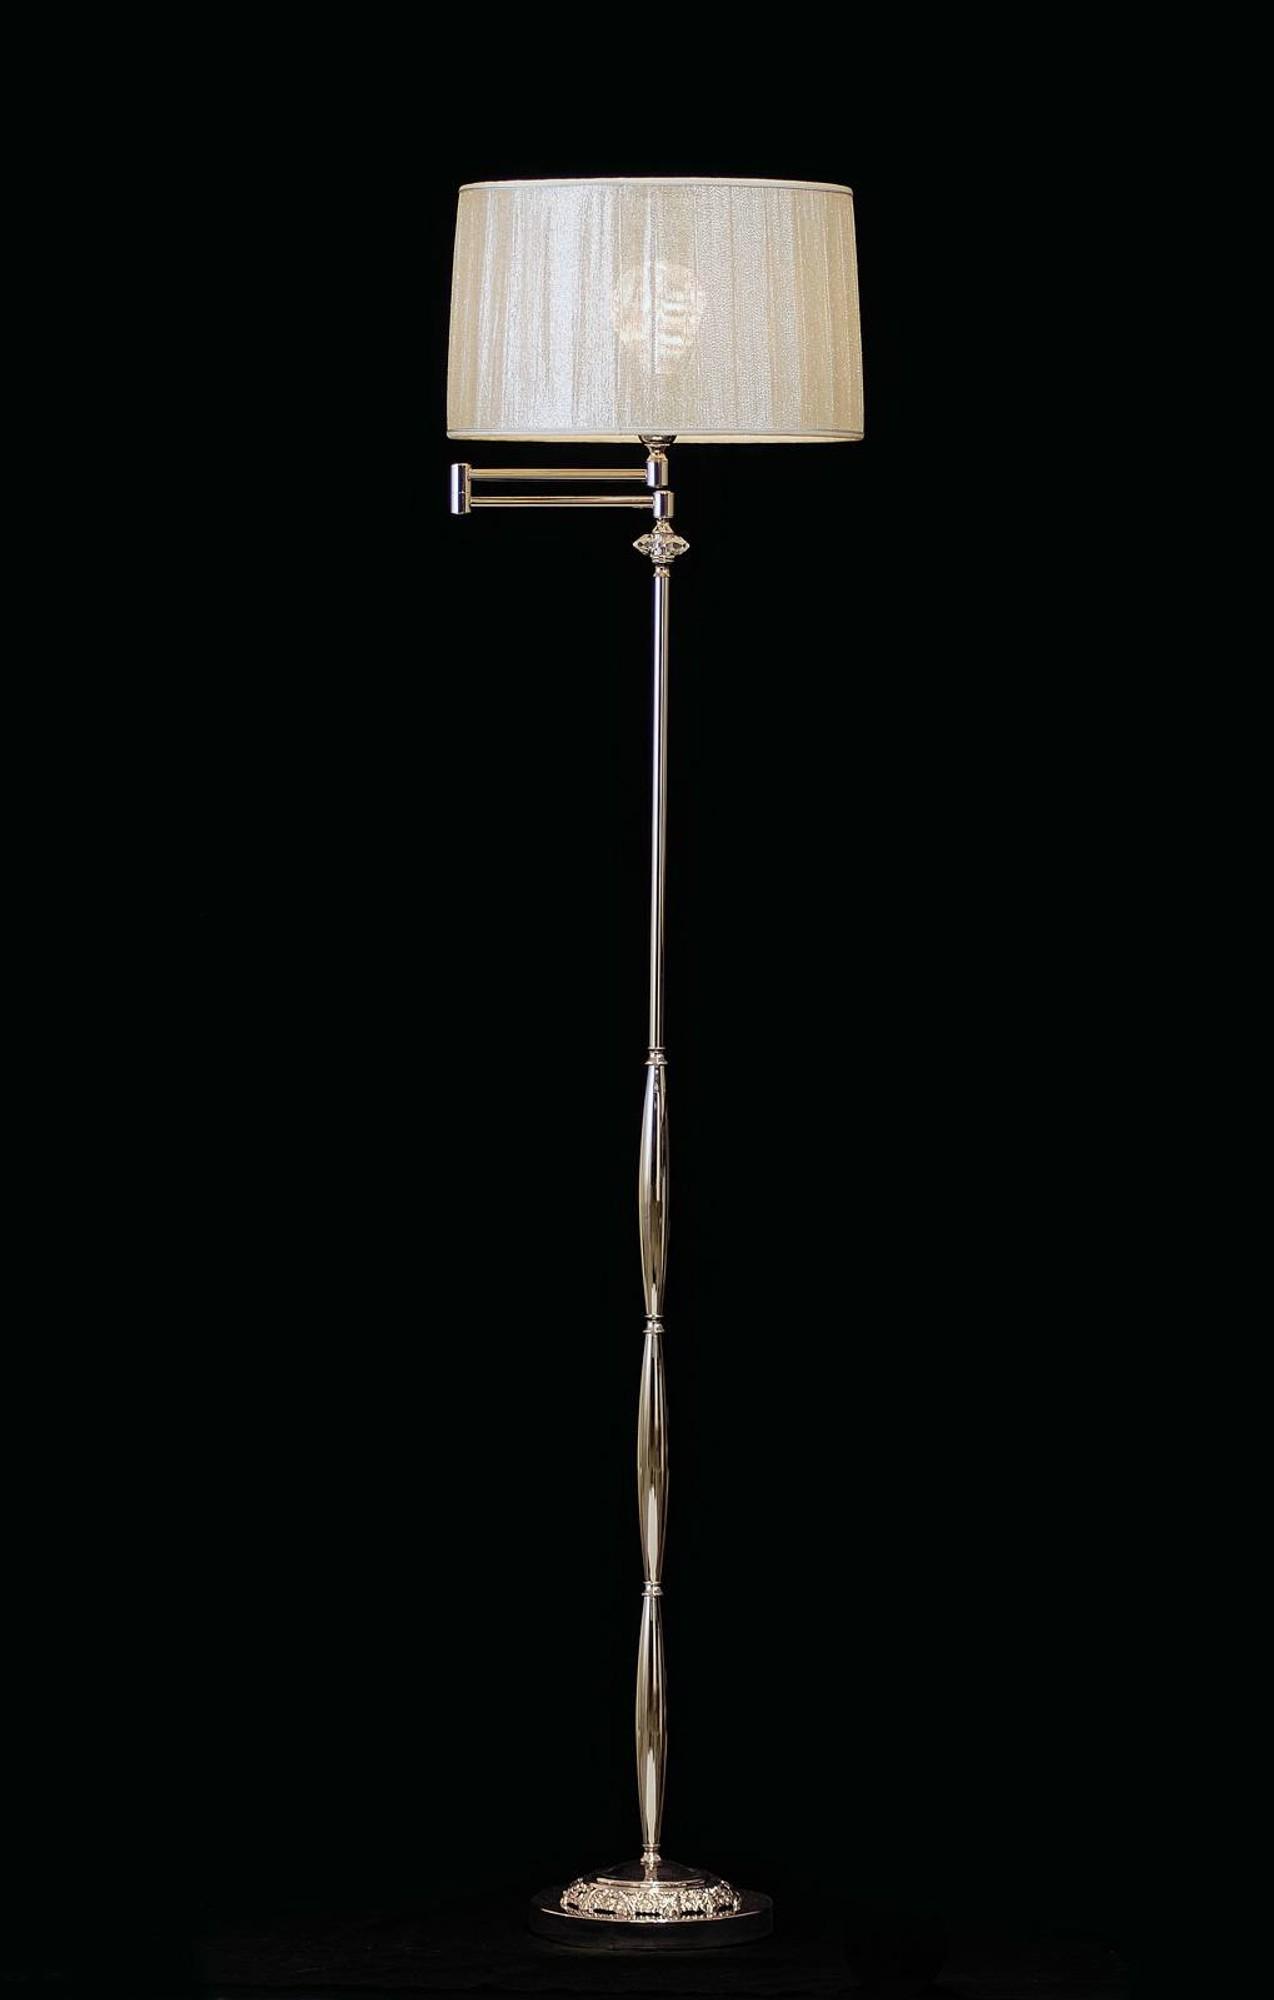 Full Size of Kristall Stehlampe Il Paralume Marina Mira Stehleuchte Pinlight Wohnzimmer Stehlampen Schlafzimmer Wohnzimmer Kristall Stehlampe